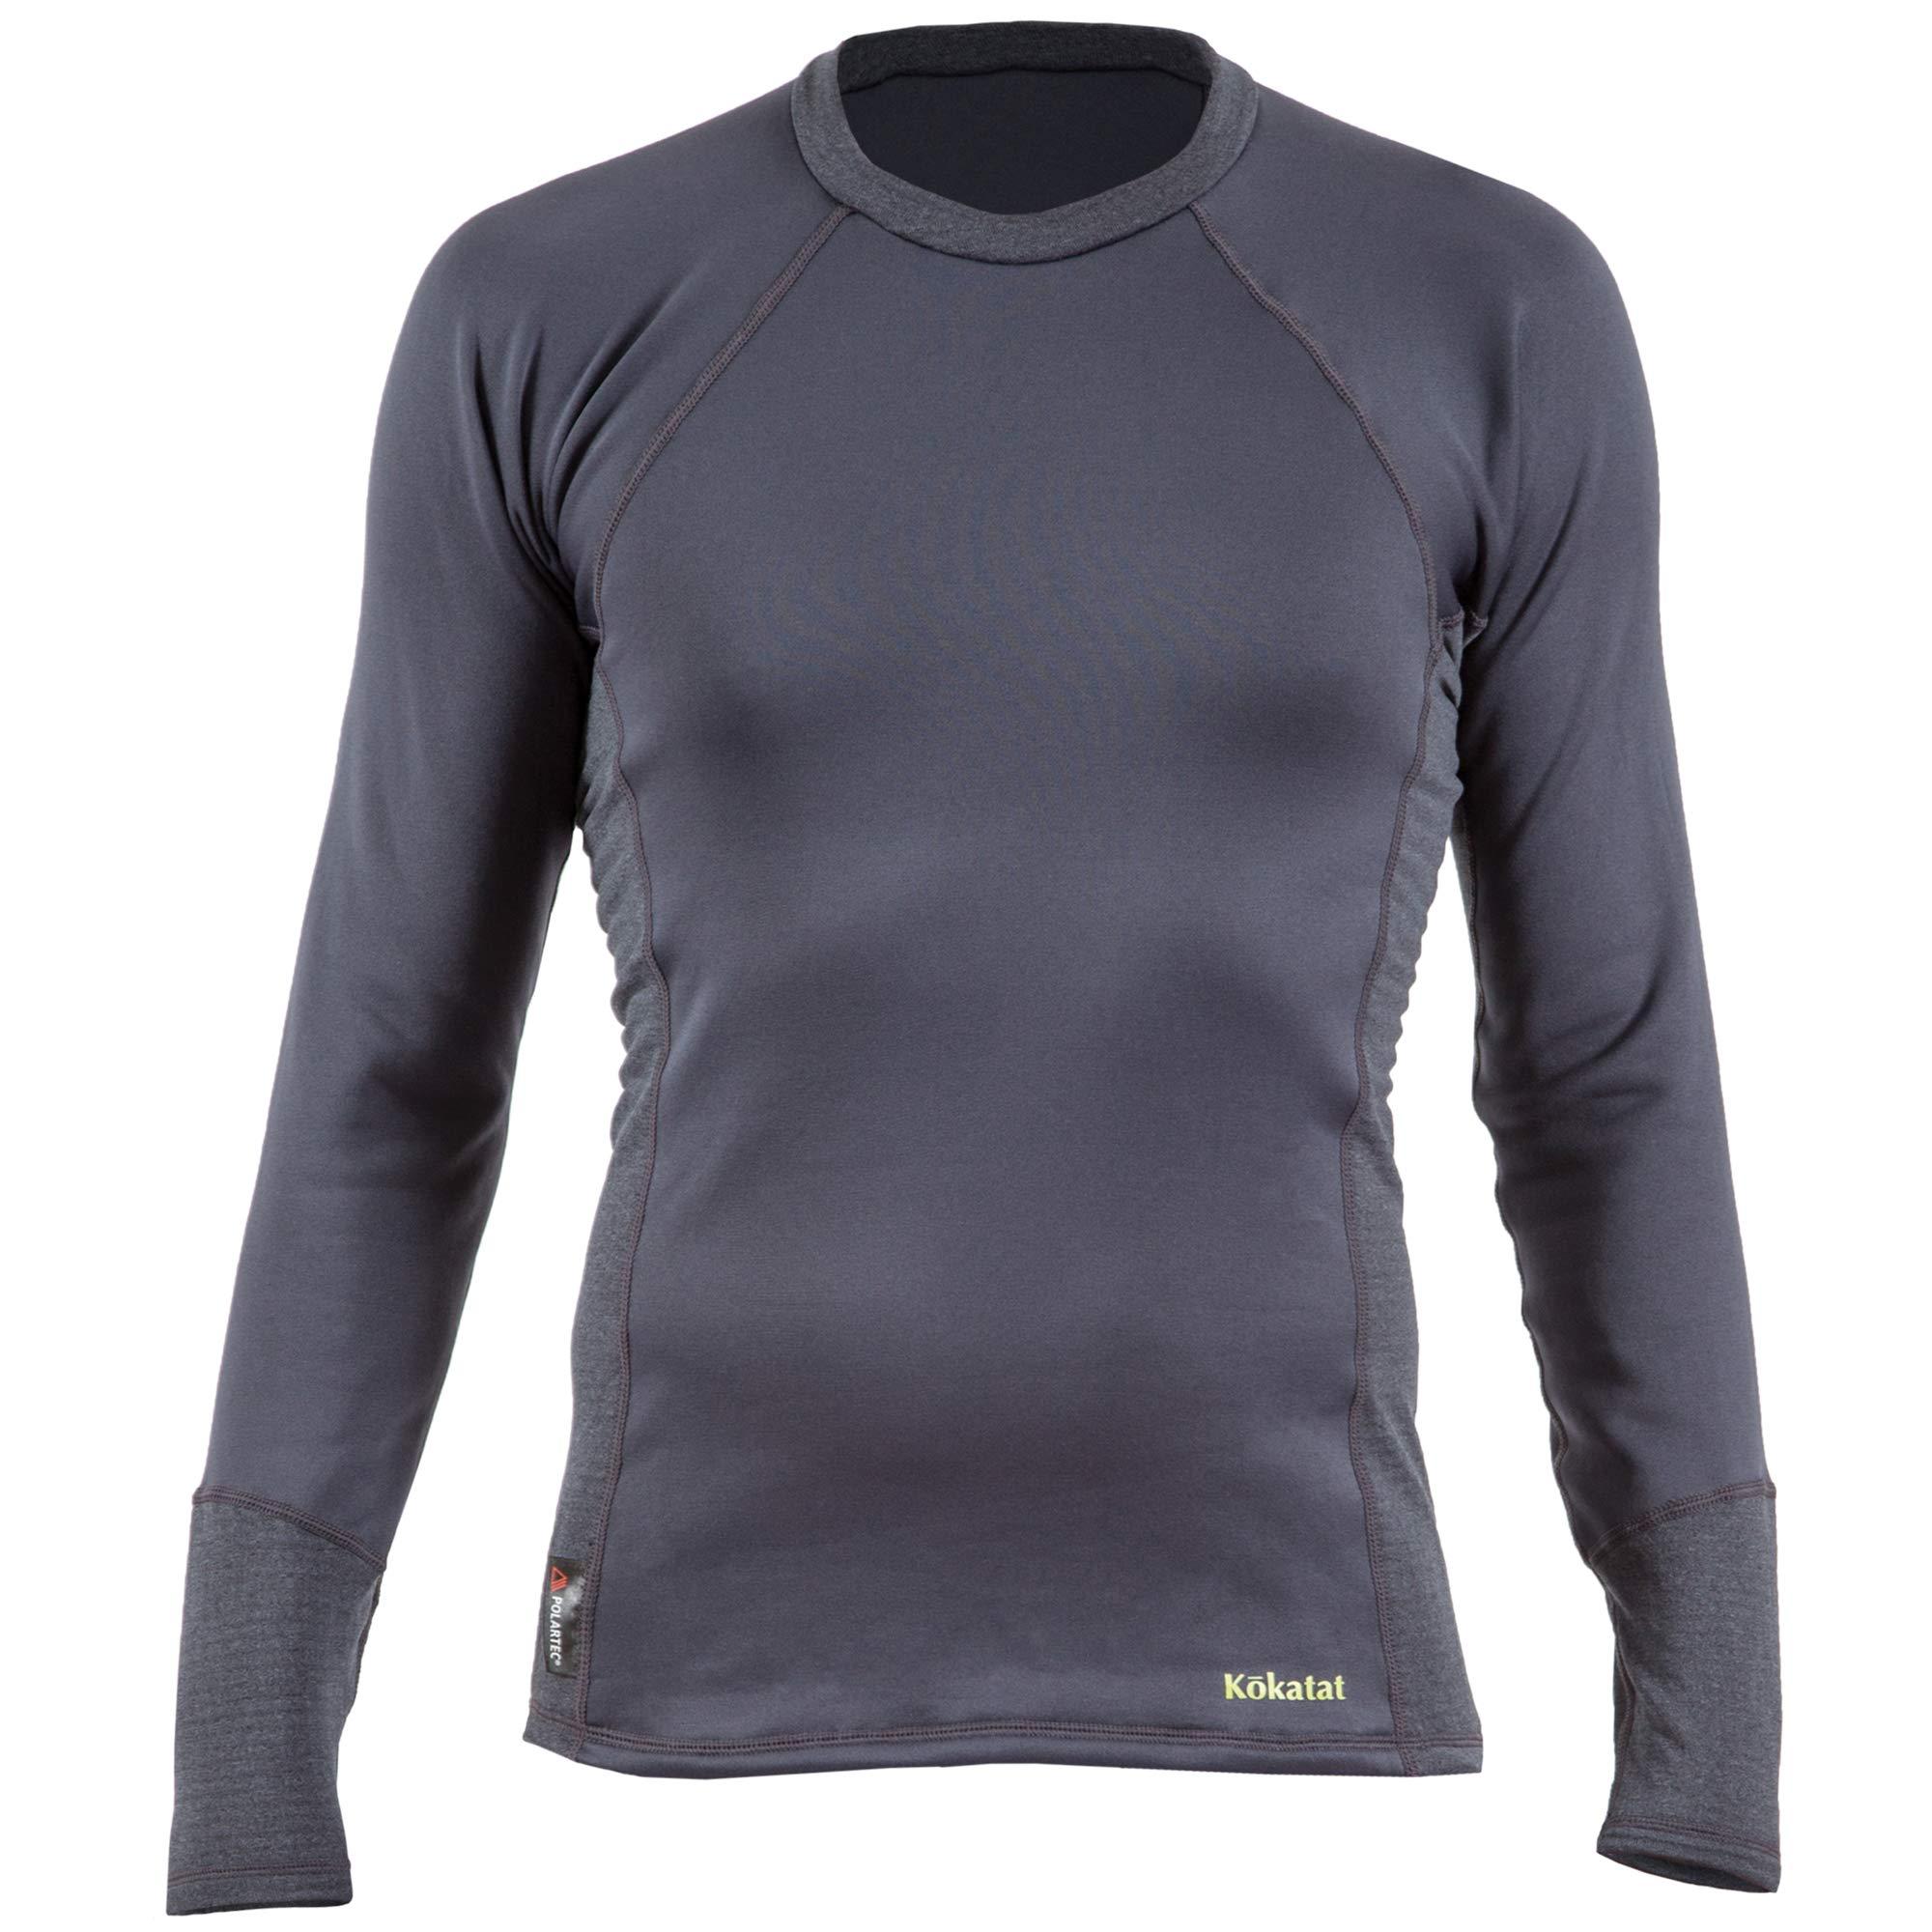 Kokatat Men's Polartec Power Dry Outercore Long Sleeve Shirt-Coal-XL by Kokatat